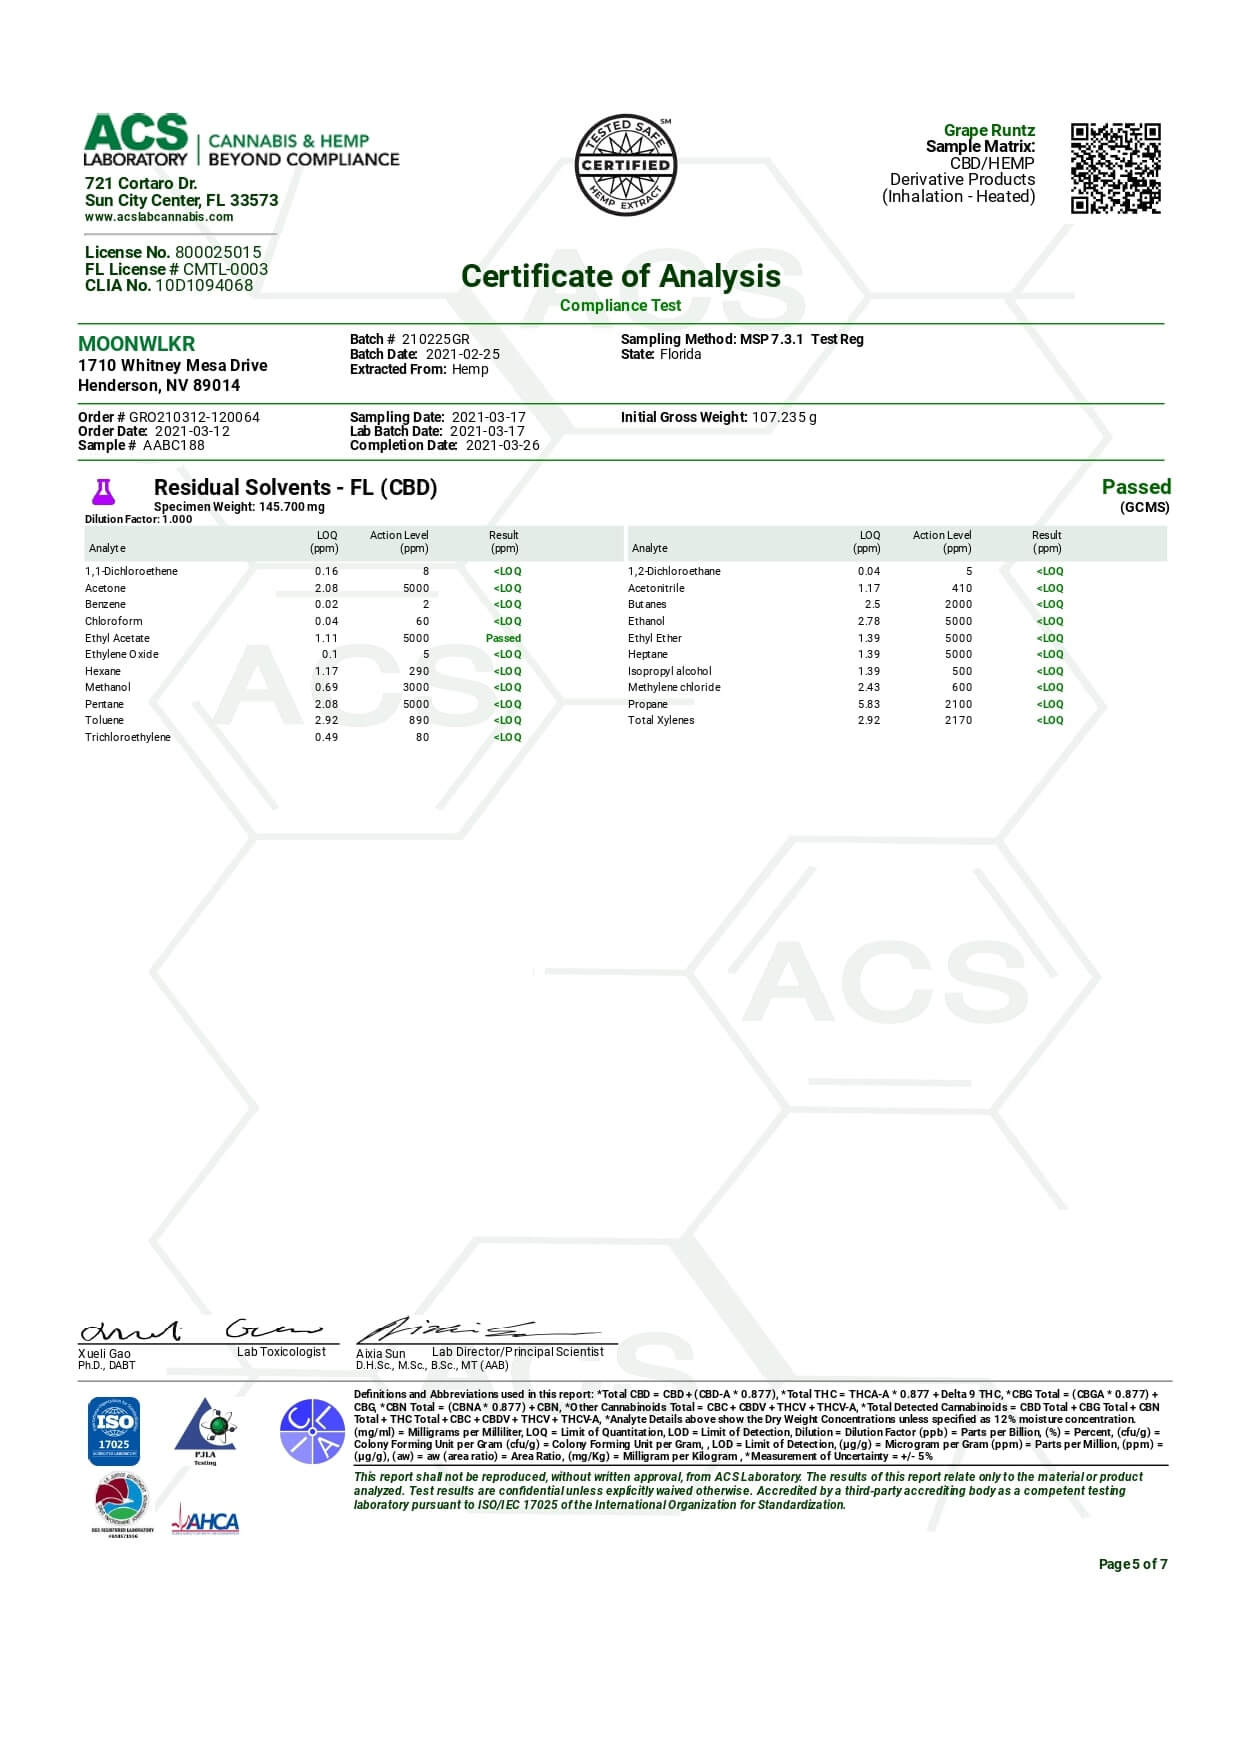 MoonWlkr Delta 8 THC Himalia Vape Cartridge Lab Report